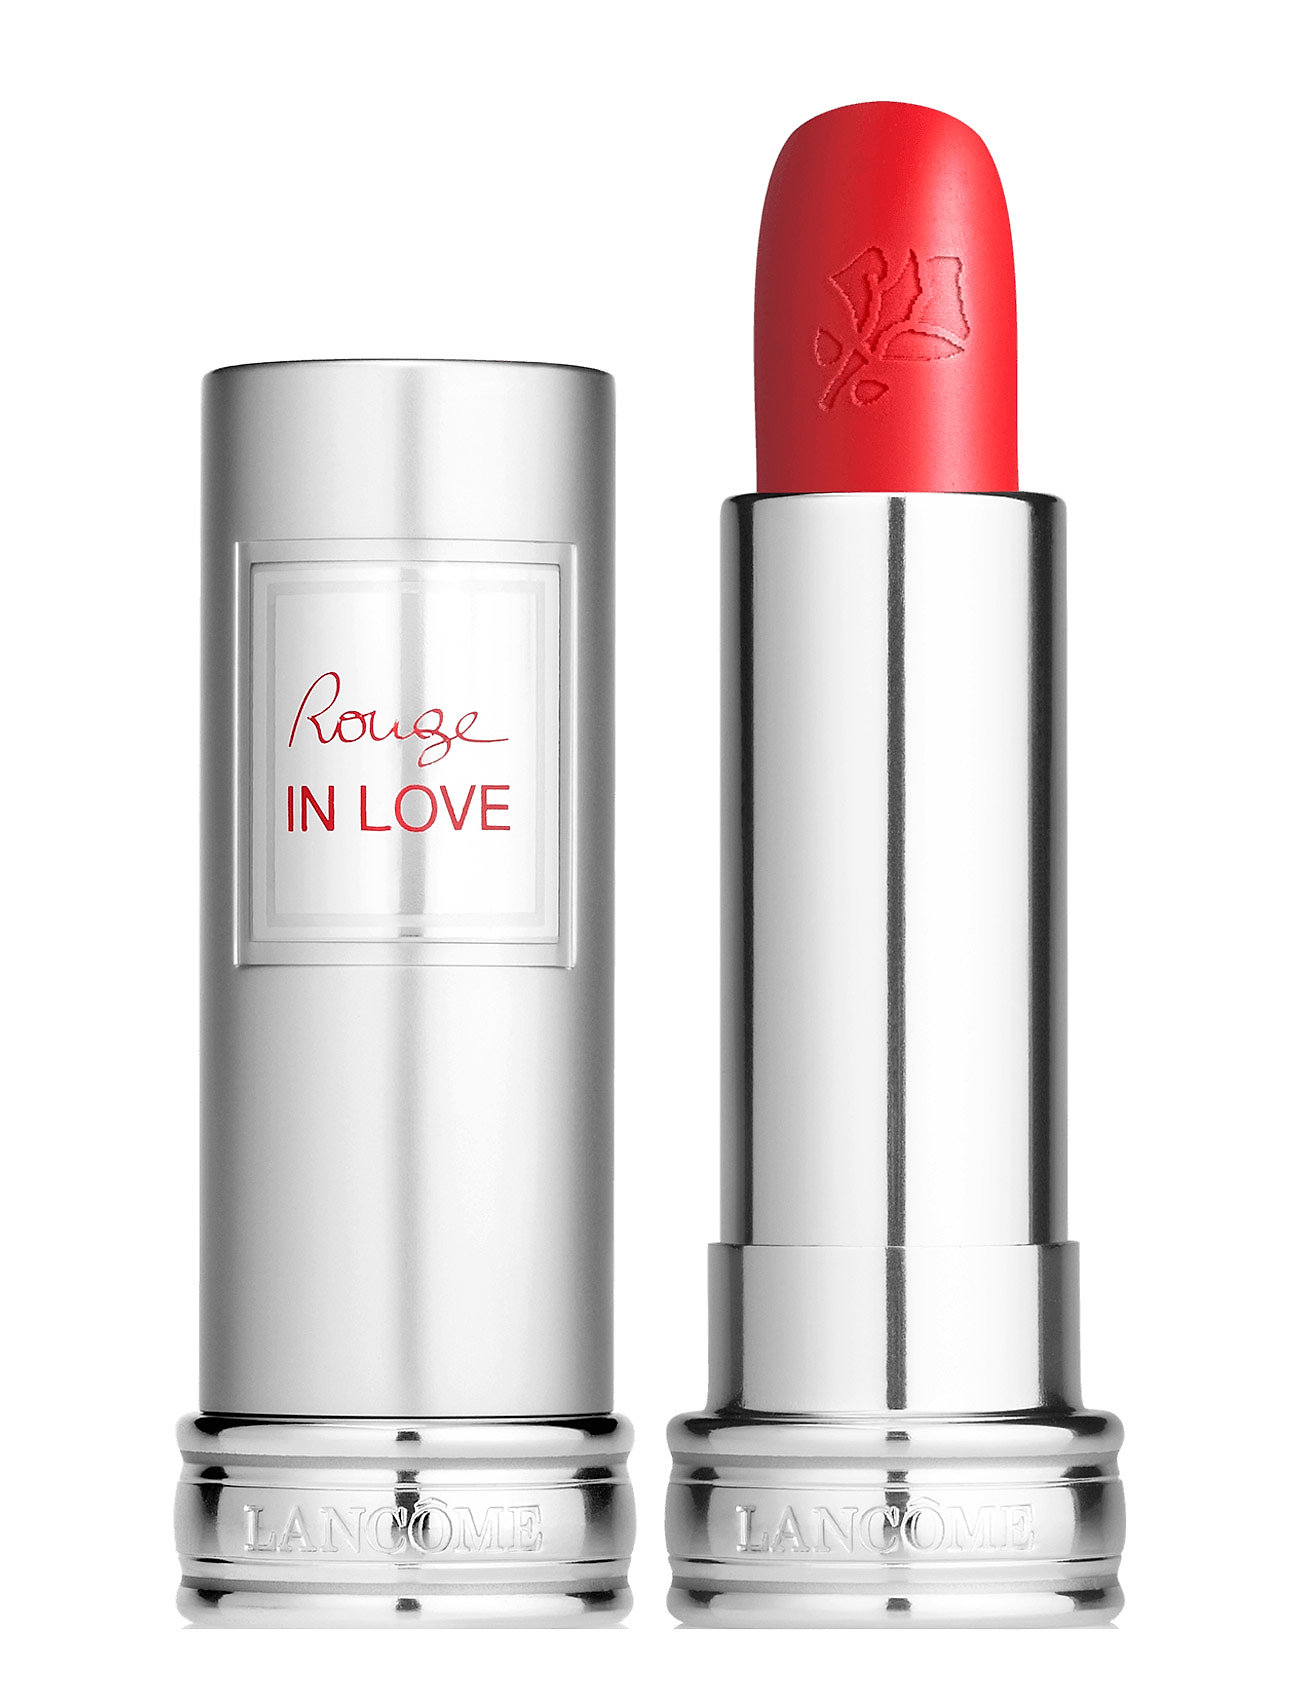 lancã´me – Rouge in love fra boozt.com dk